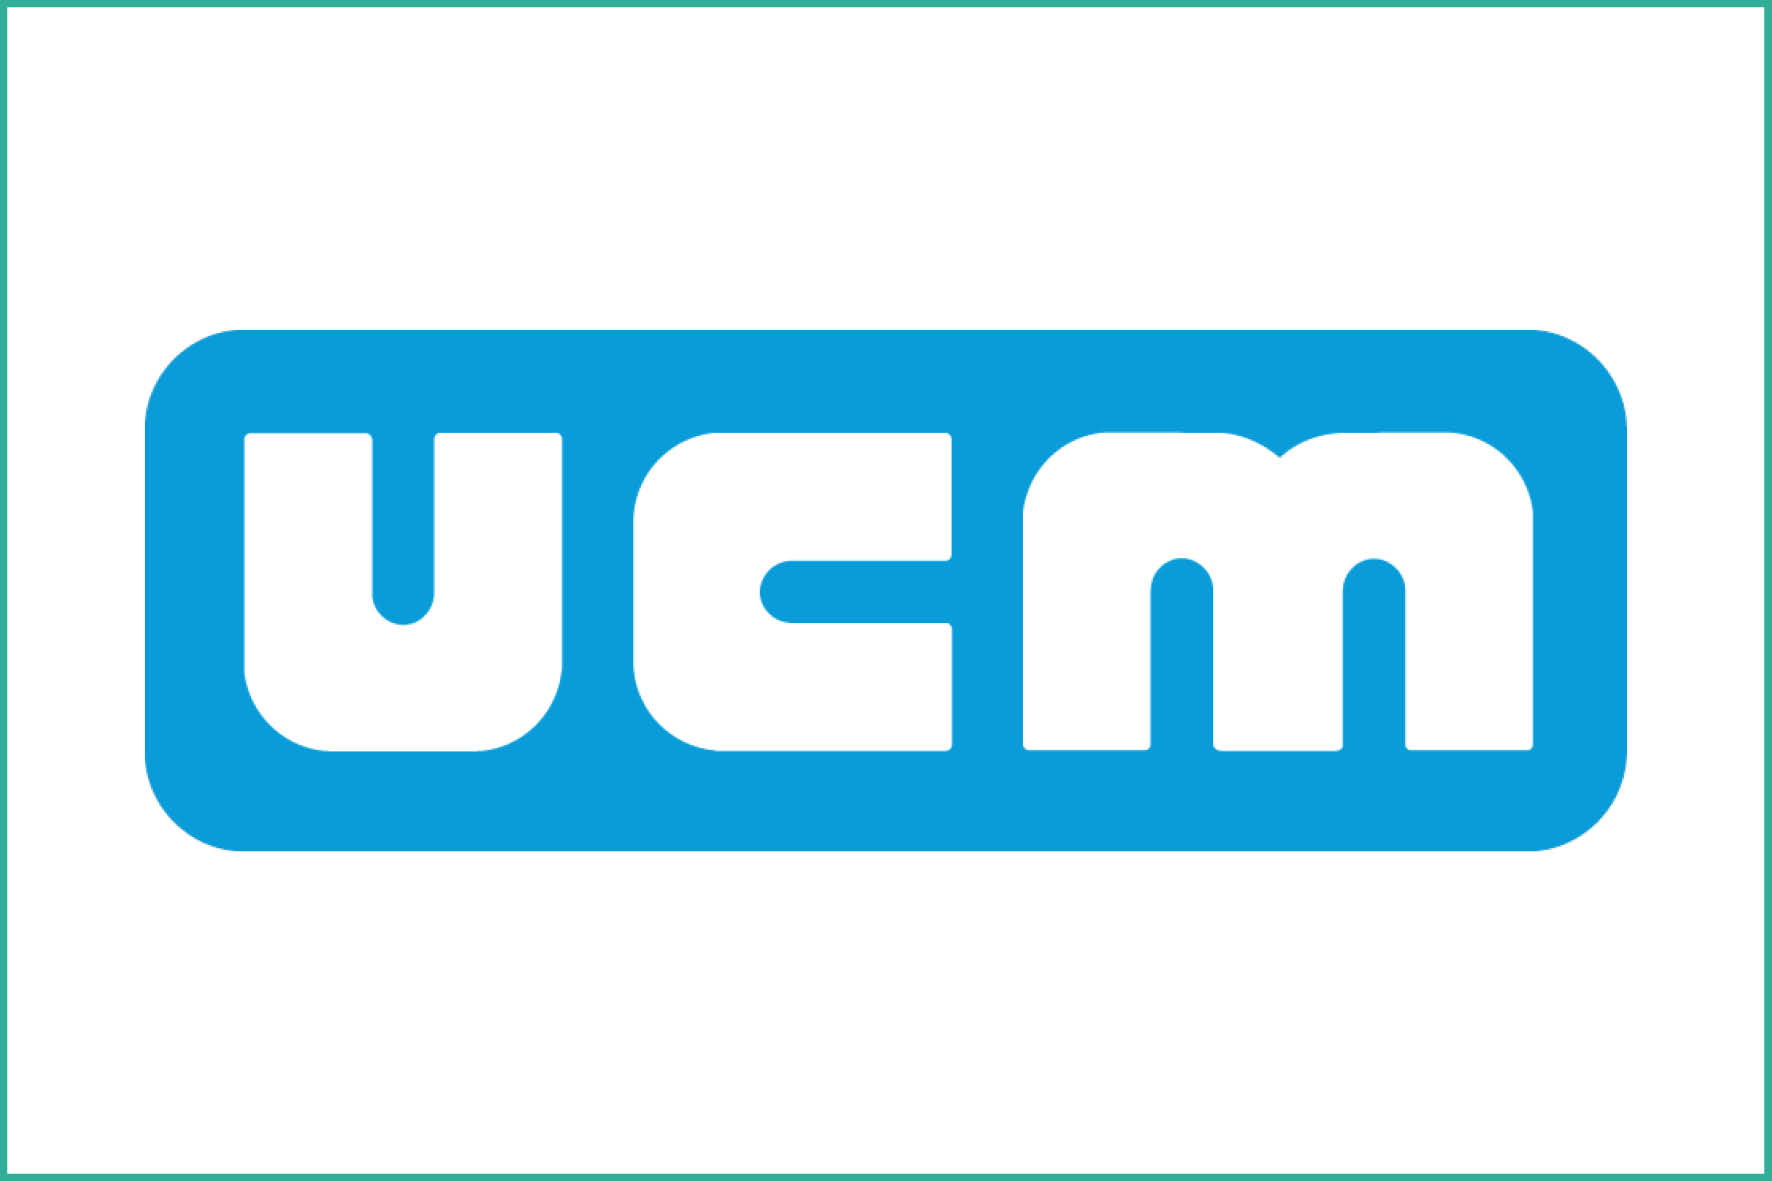 bcc-ucm